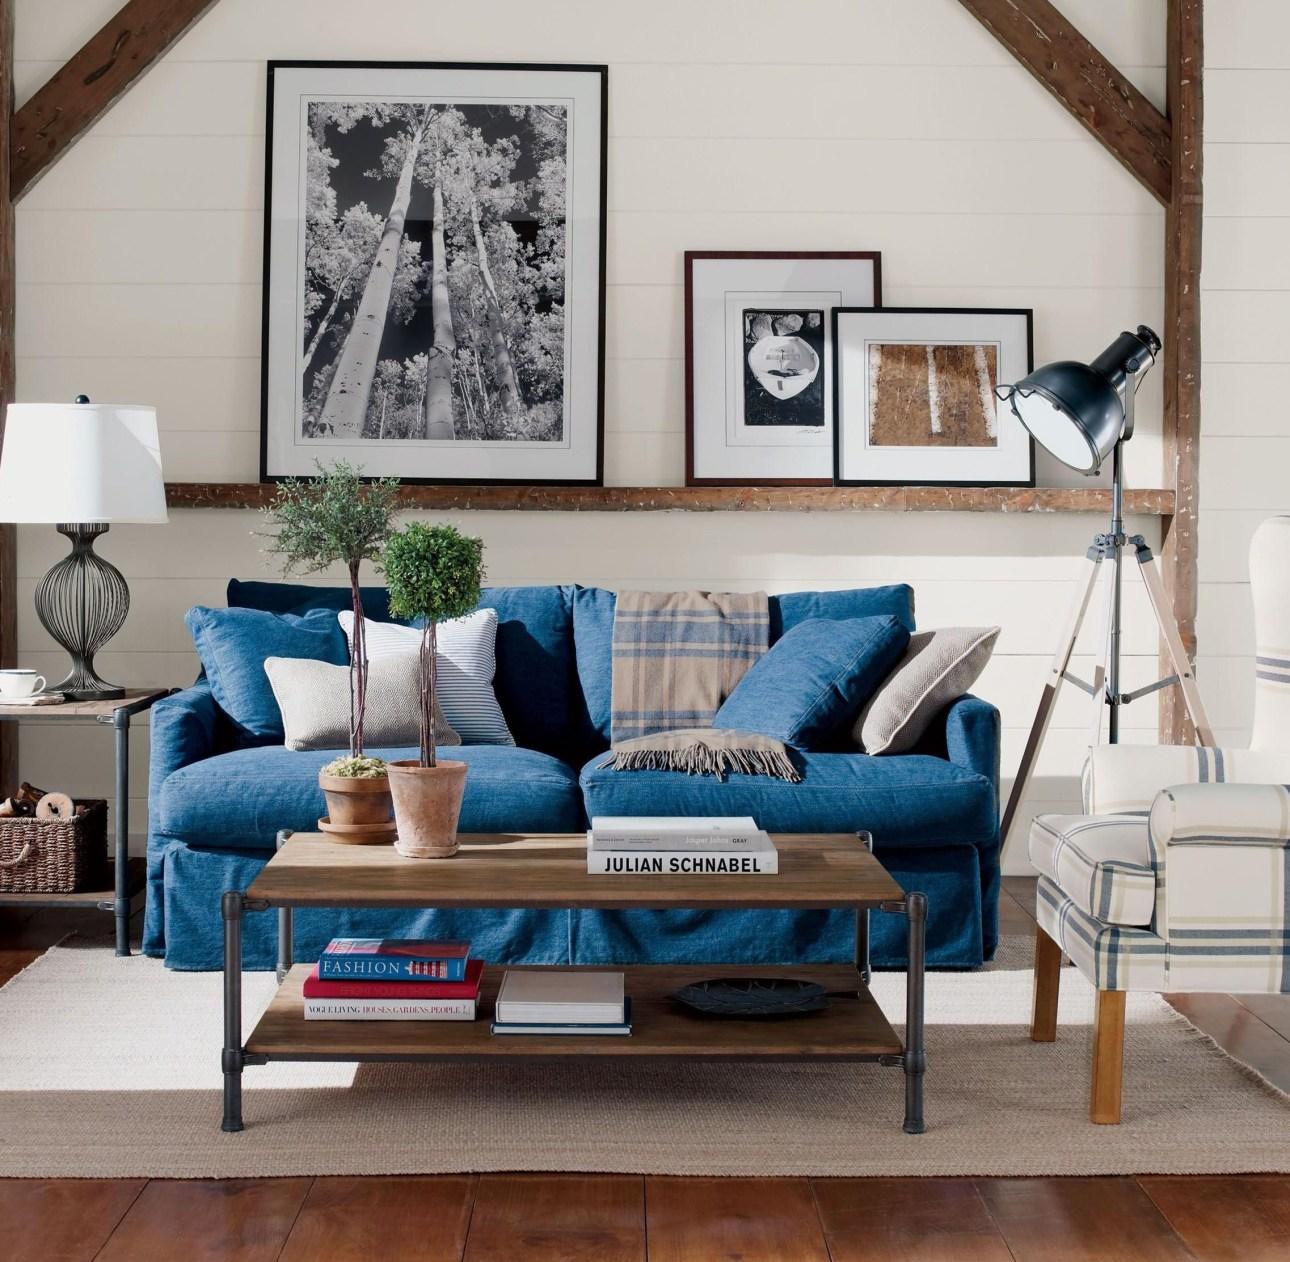 Sofa with indigo denim slipcover.